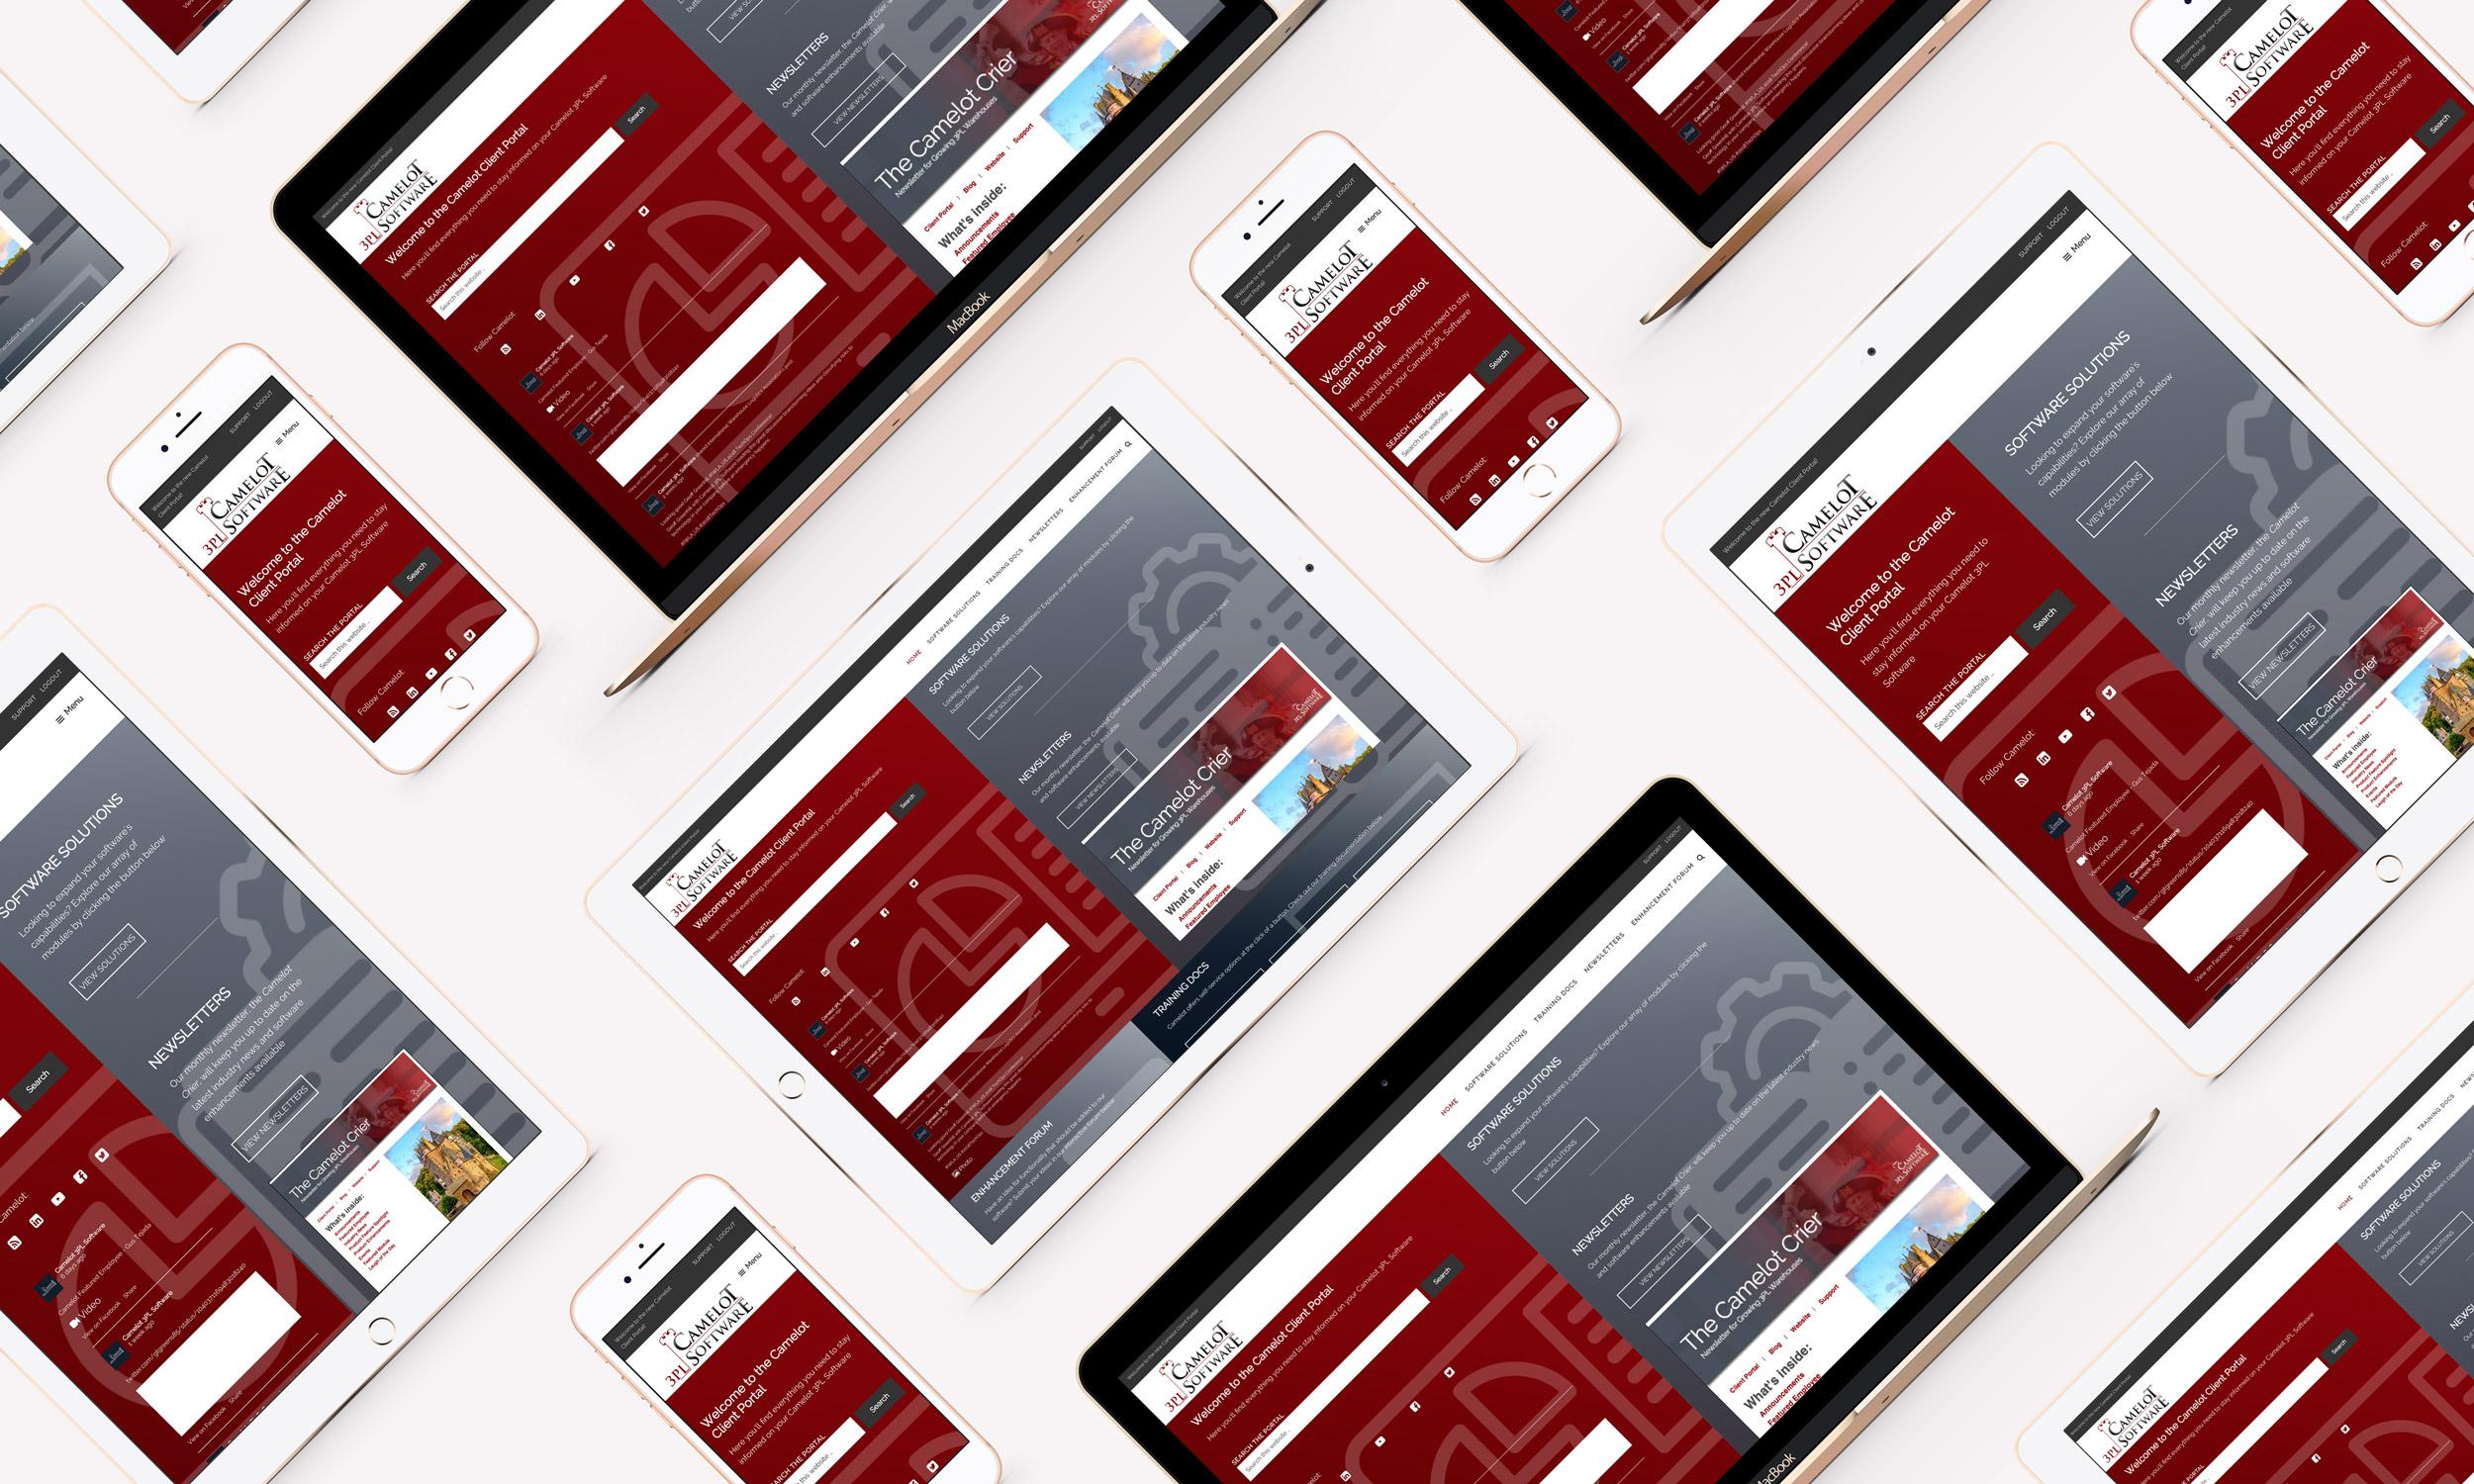 3plsoftware-client-portal-design-charlotte.jpg